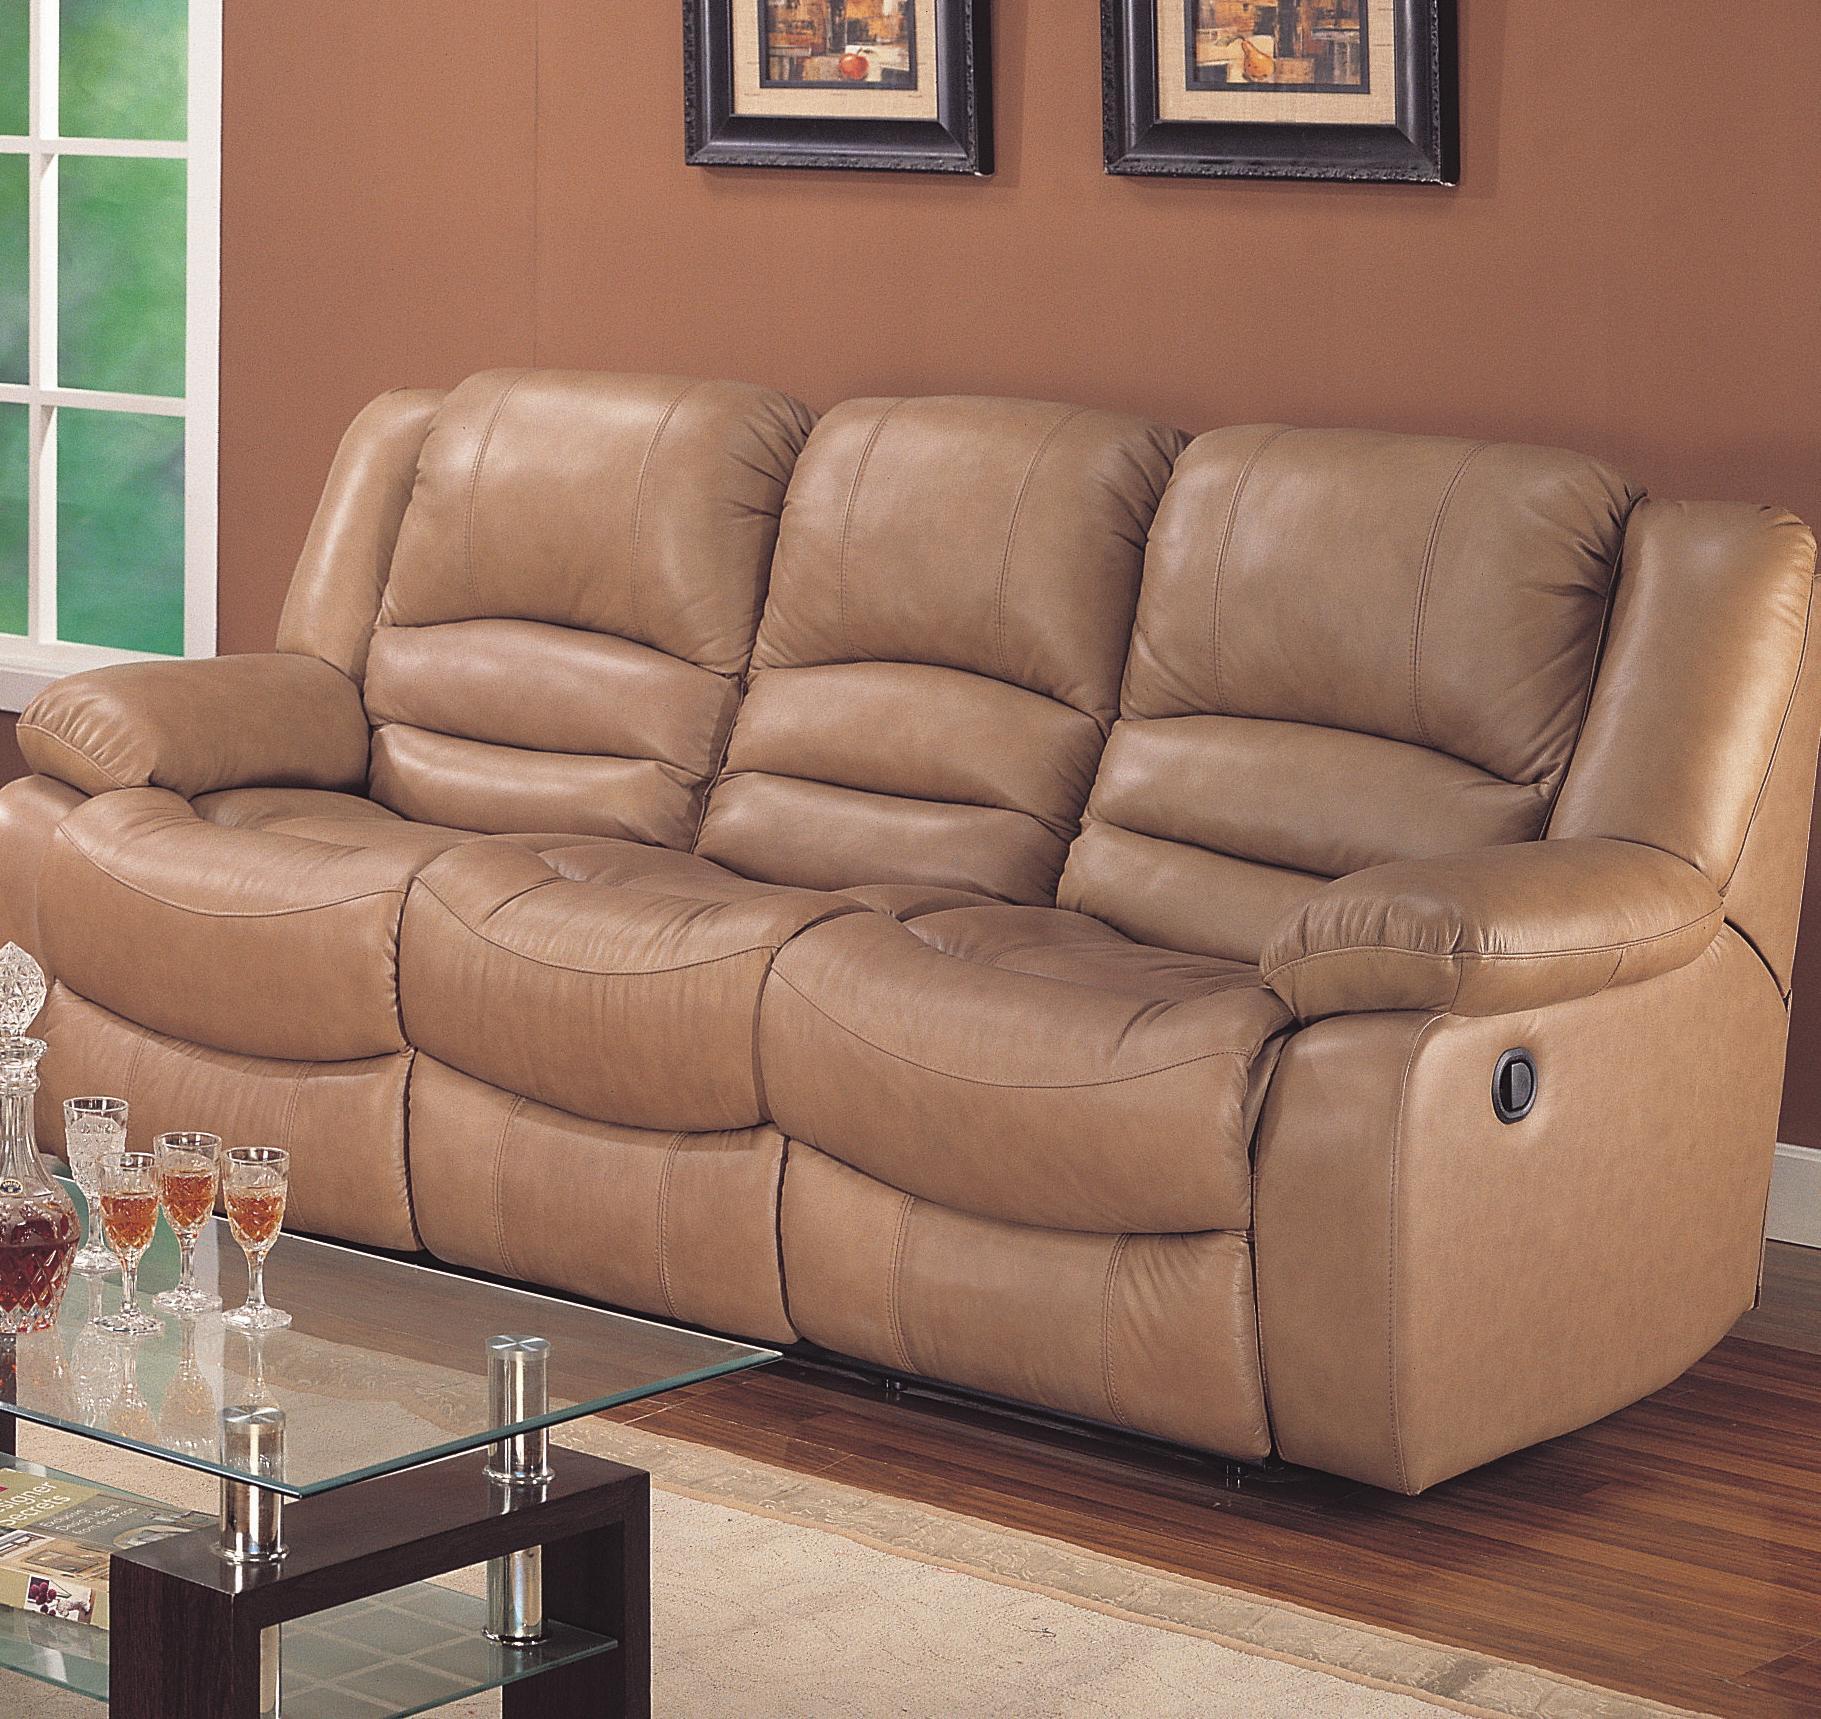 Bon Era Nouveau 18009 Casual Three Seater Dual Reclining Sofa With Lumbar  Support